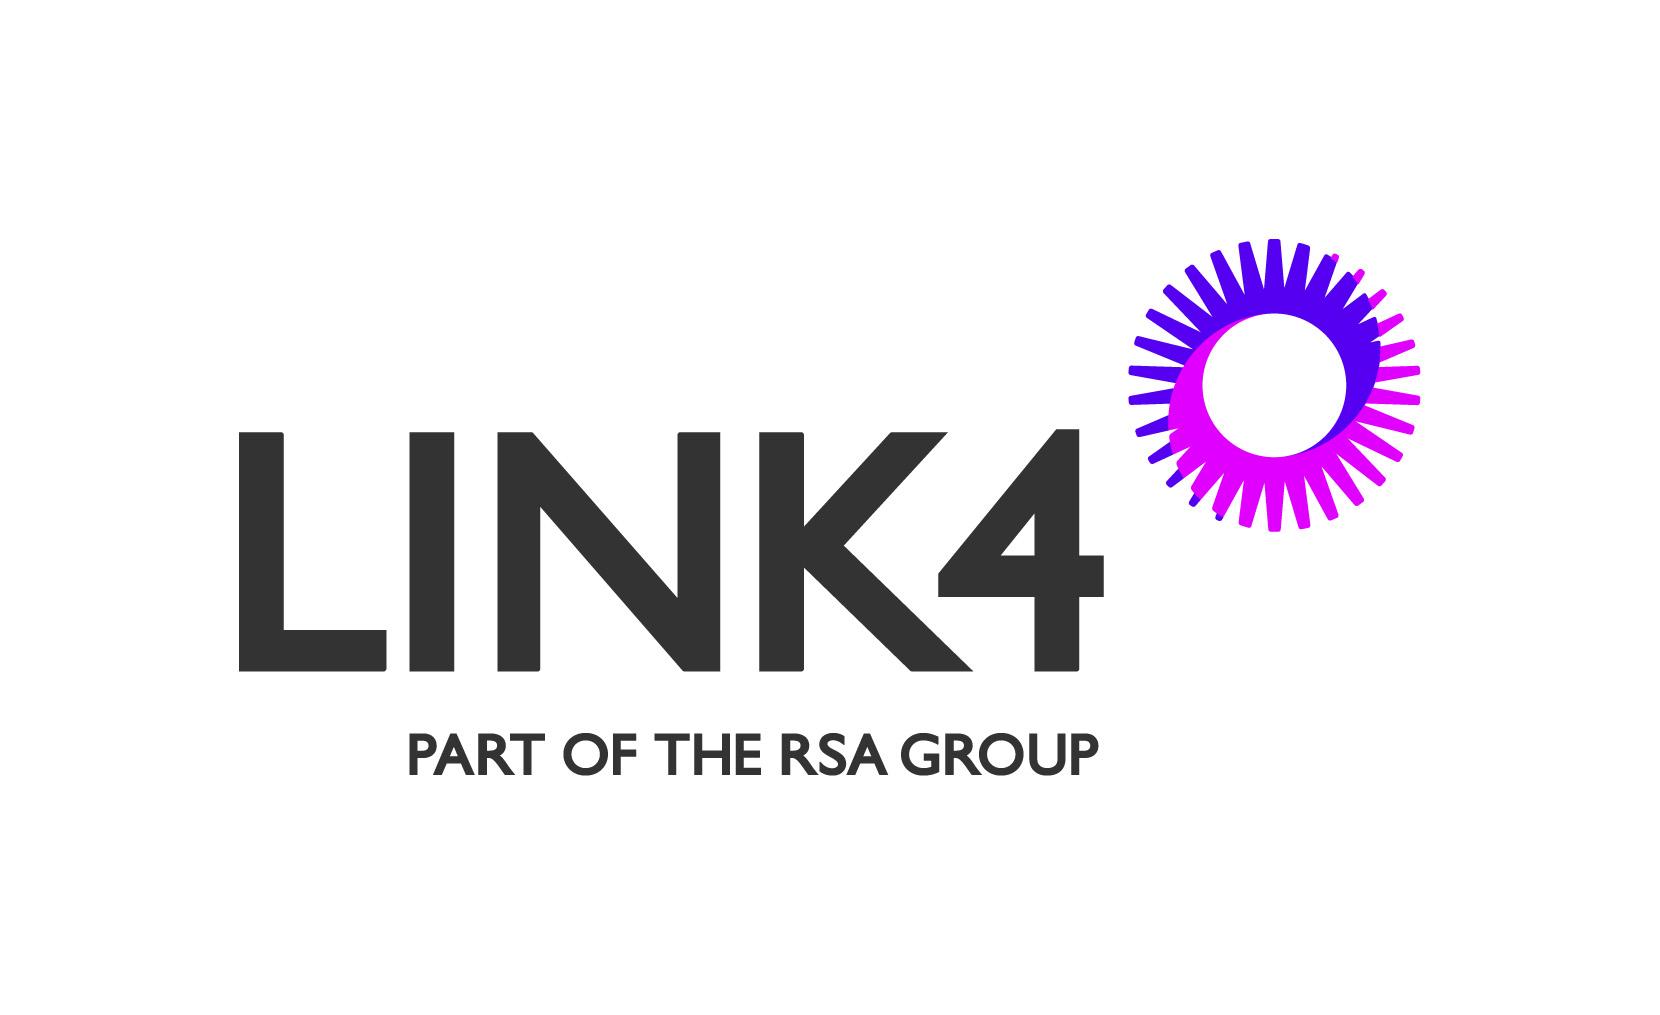 LINK4 Szczecin